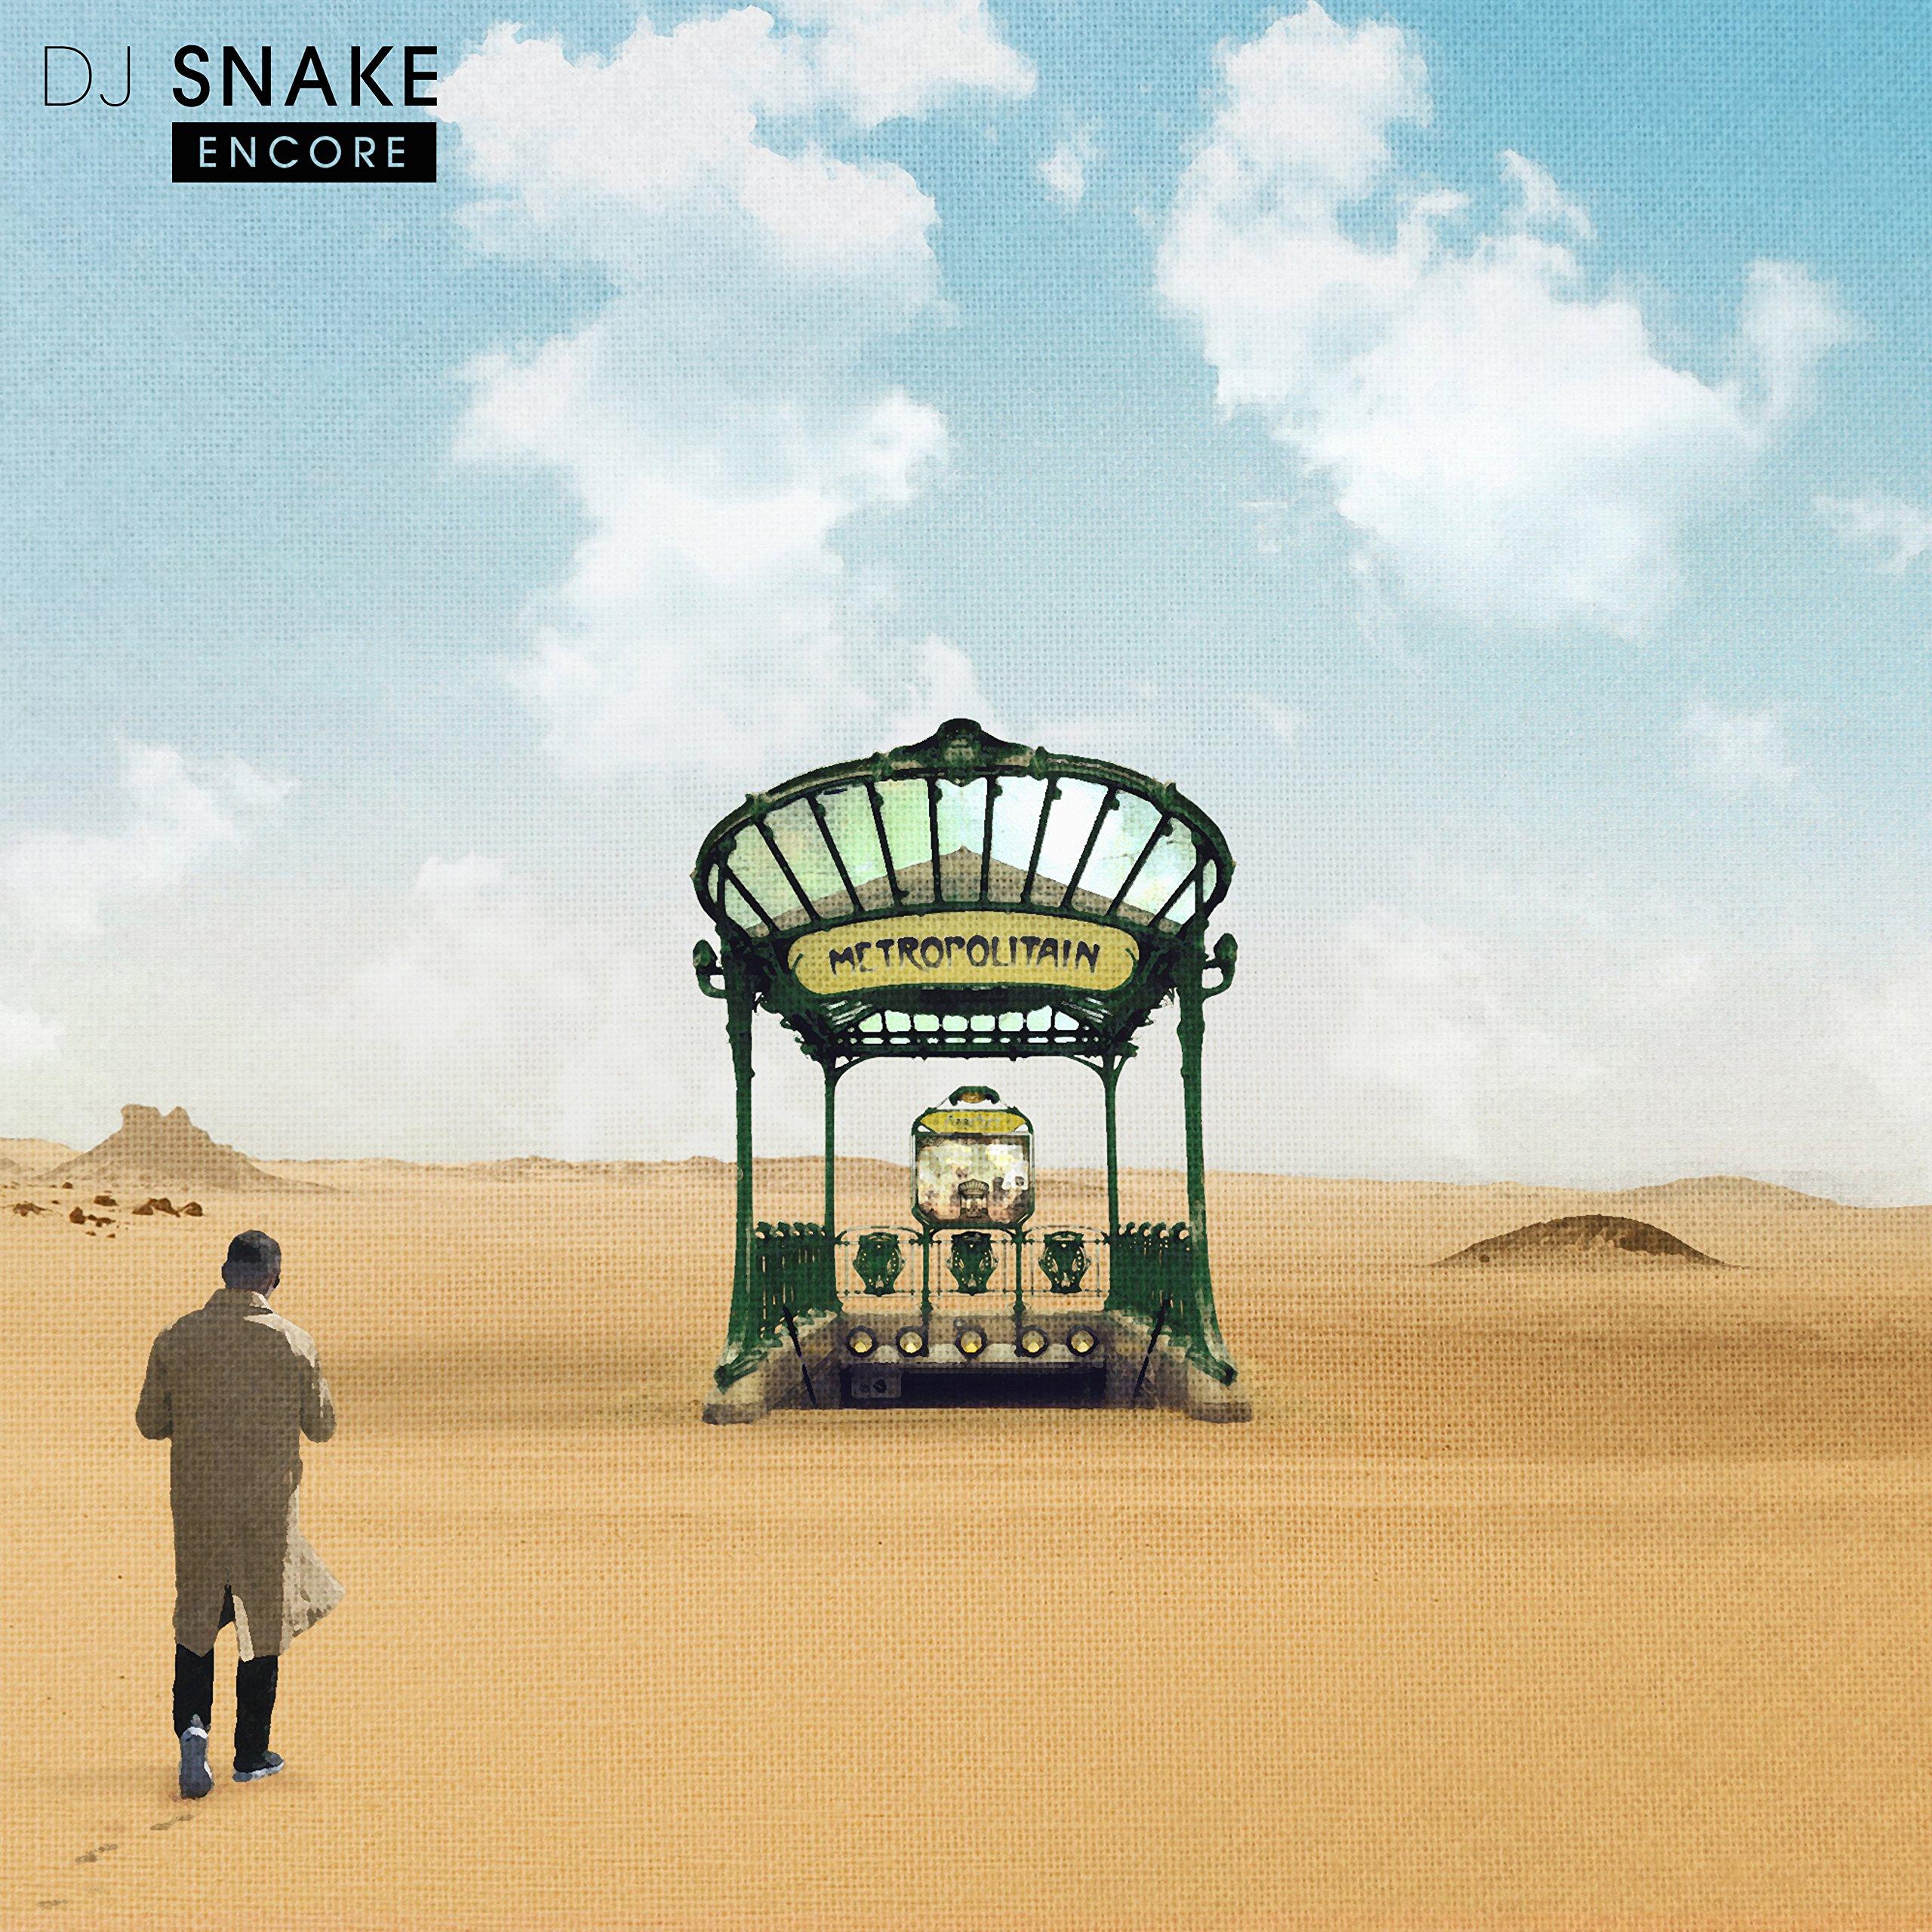 CD : DJ Snake - Encore [Explicit Content]